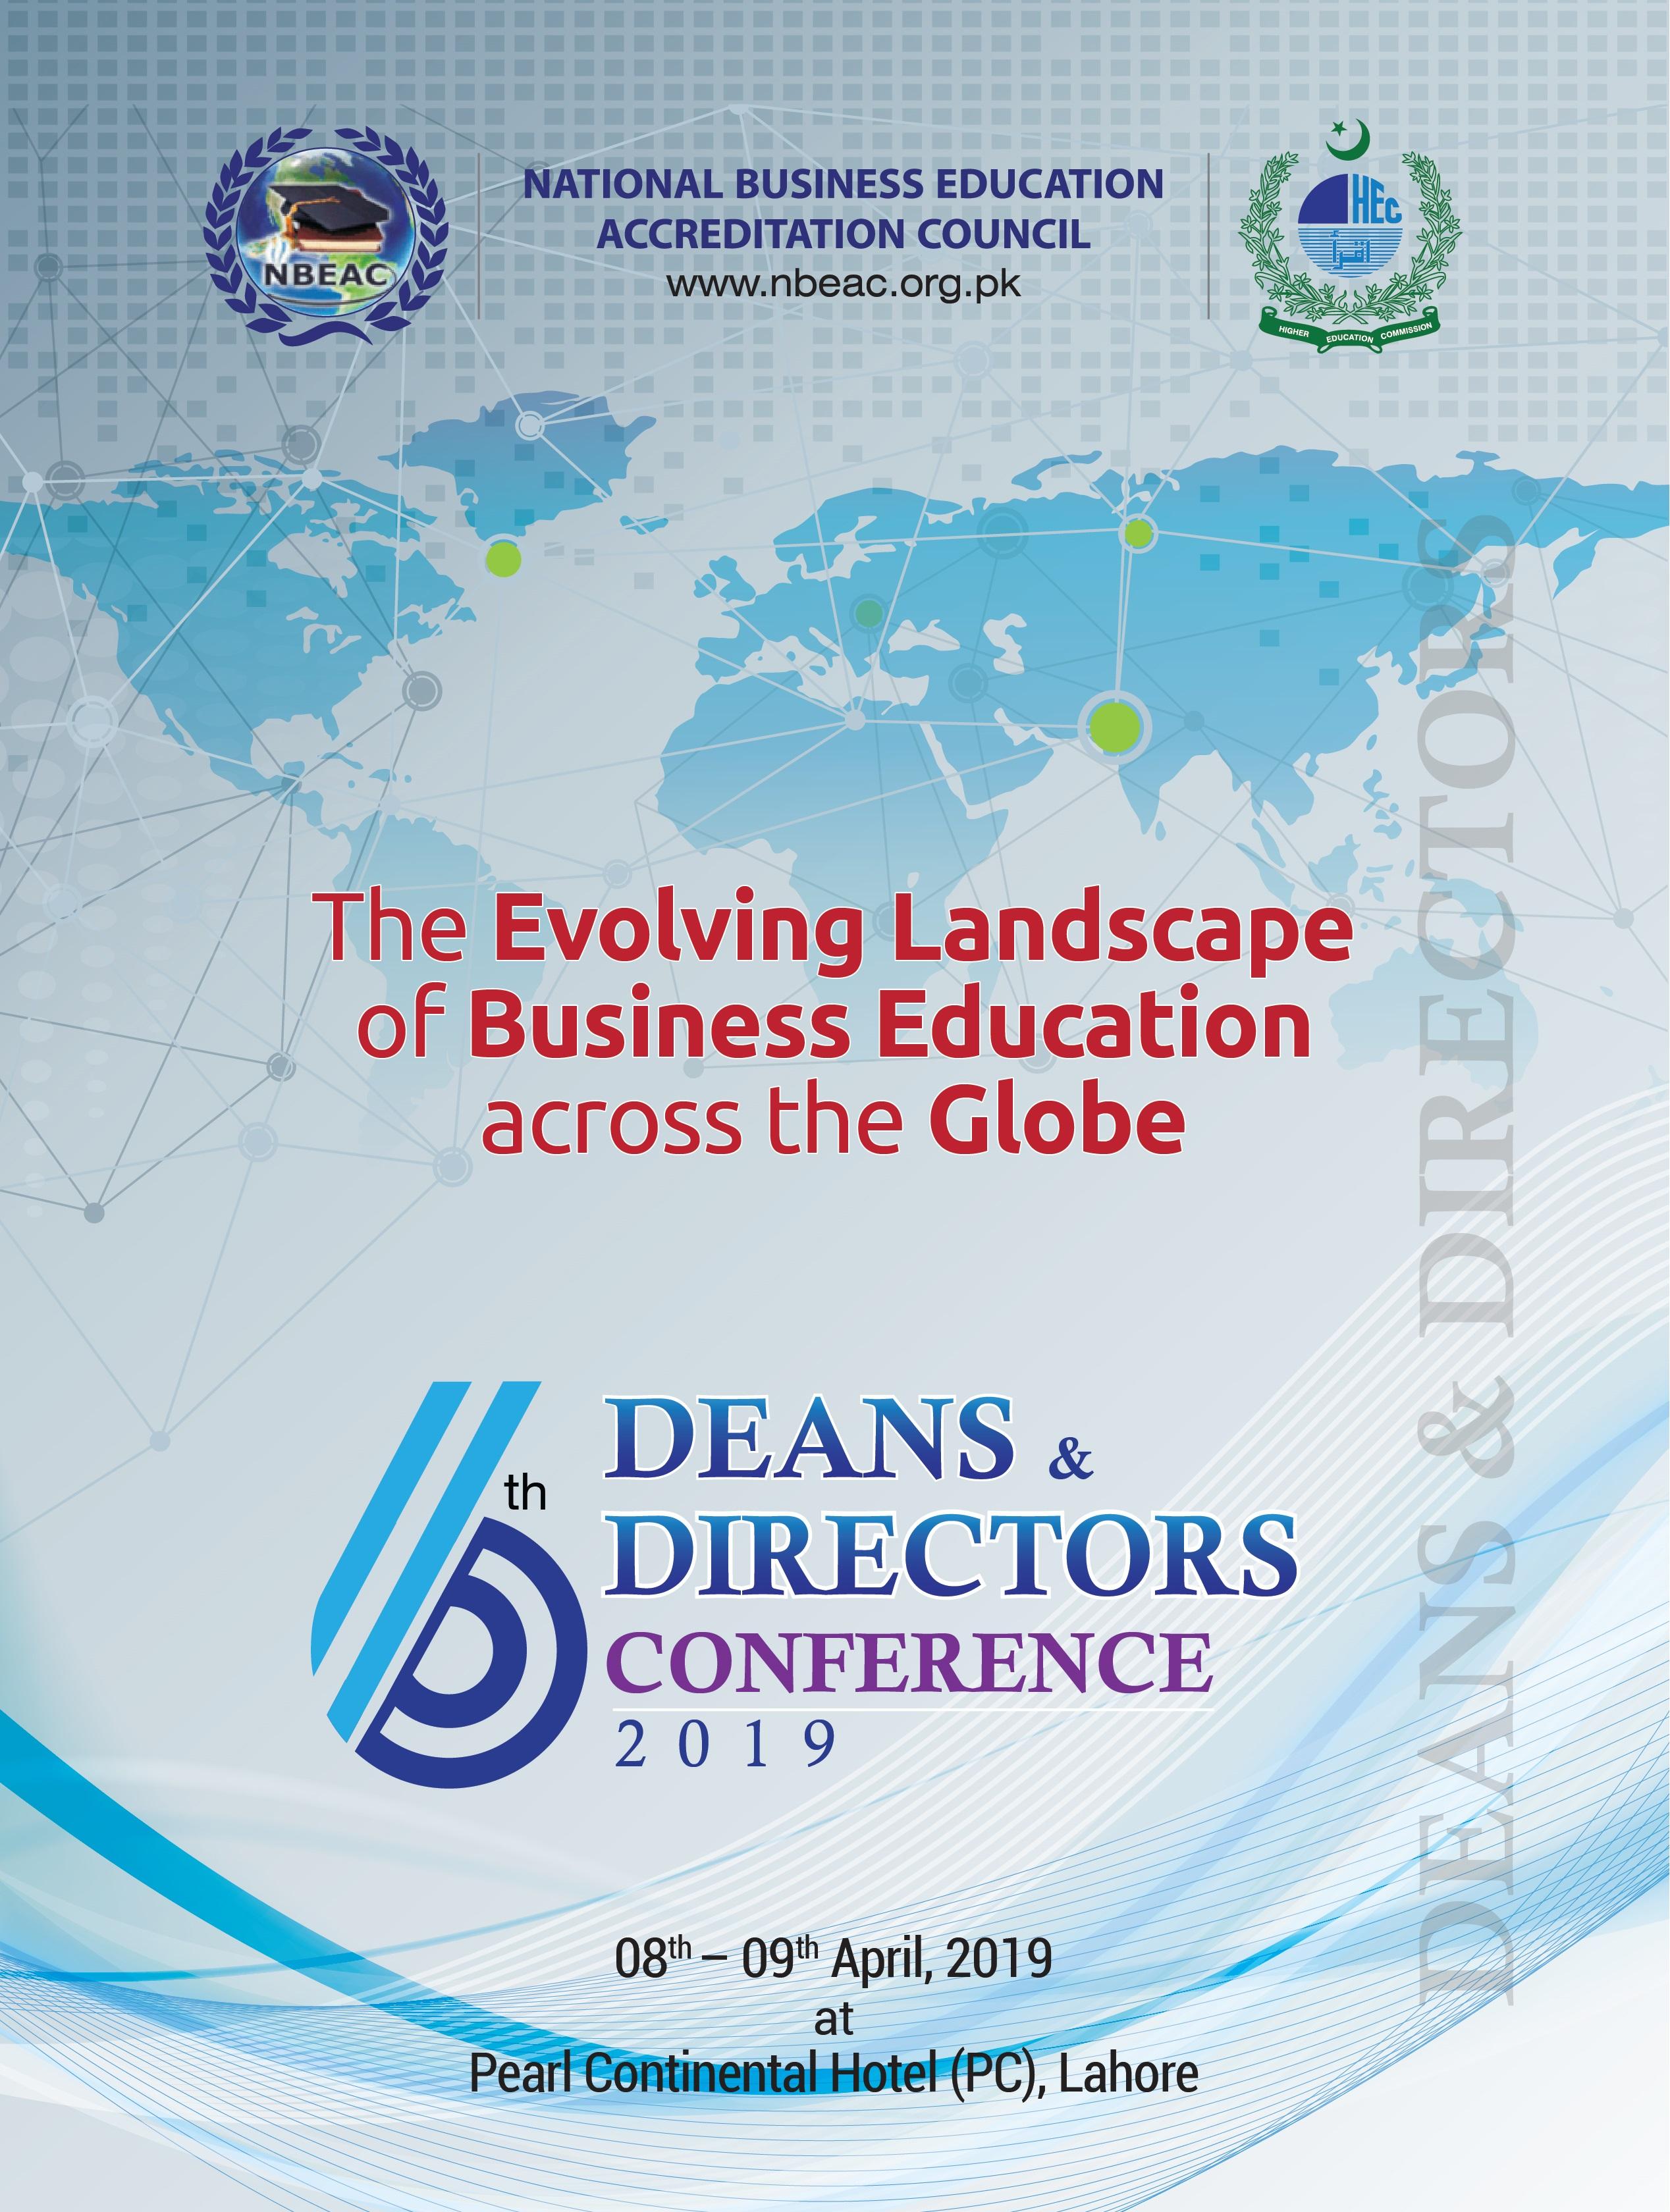 6th Deans & Directors Conference 2019   NBEAC